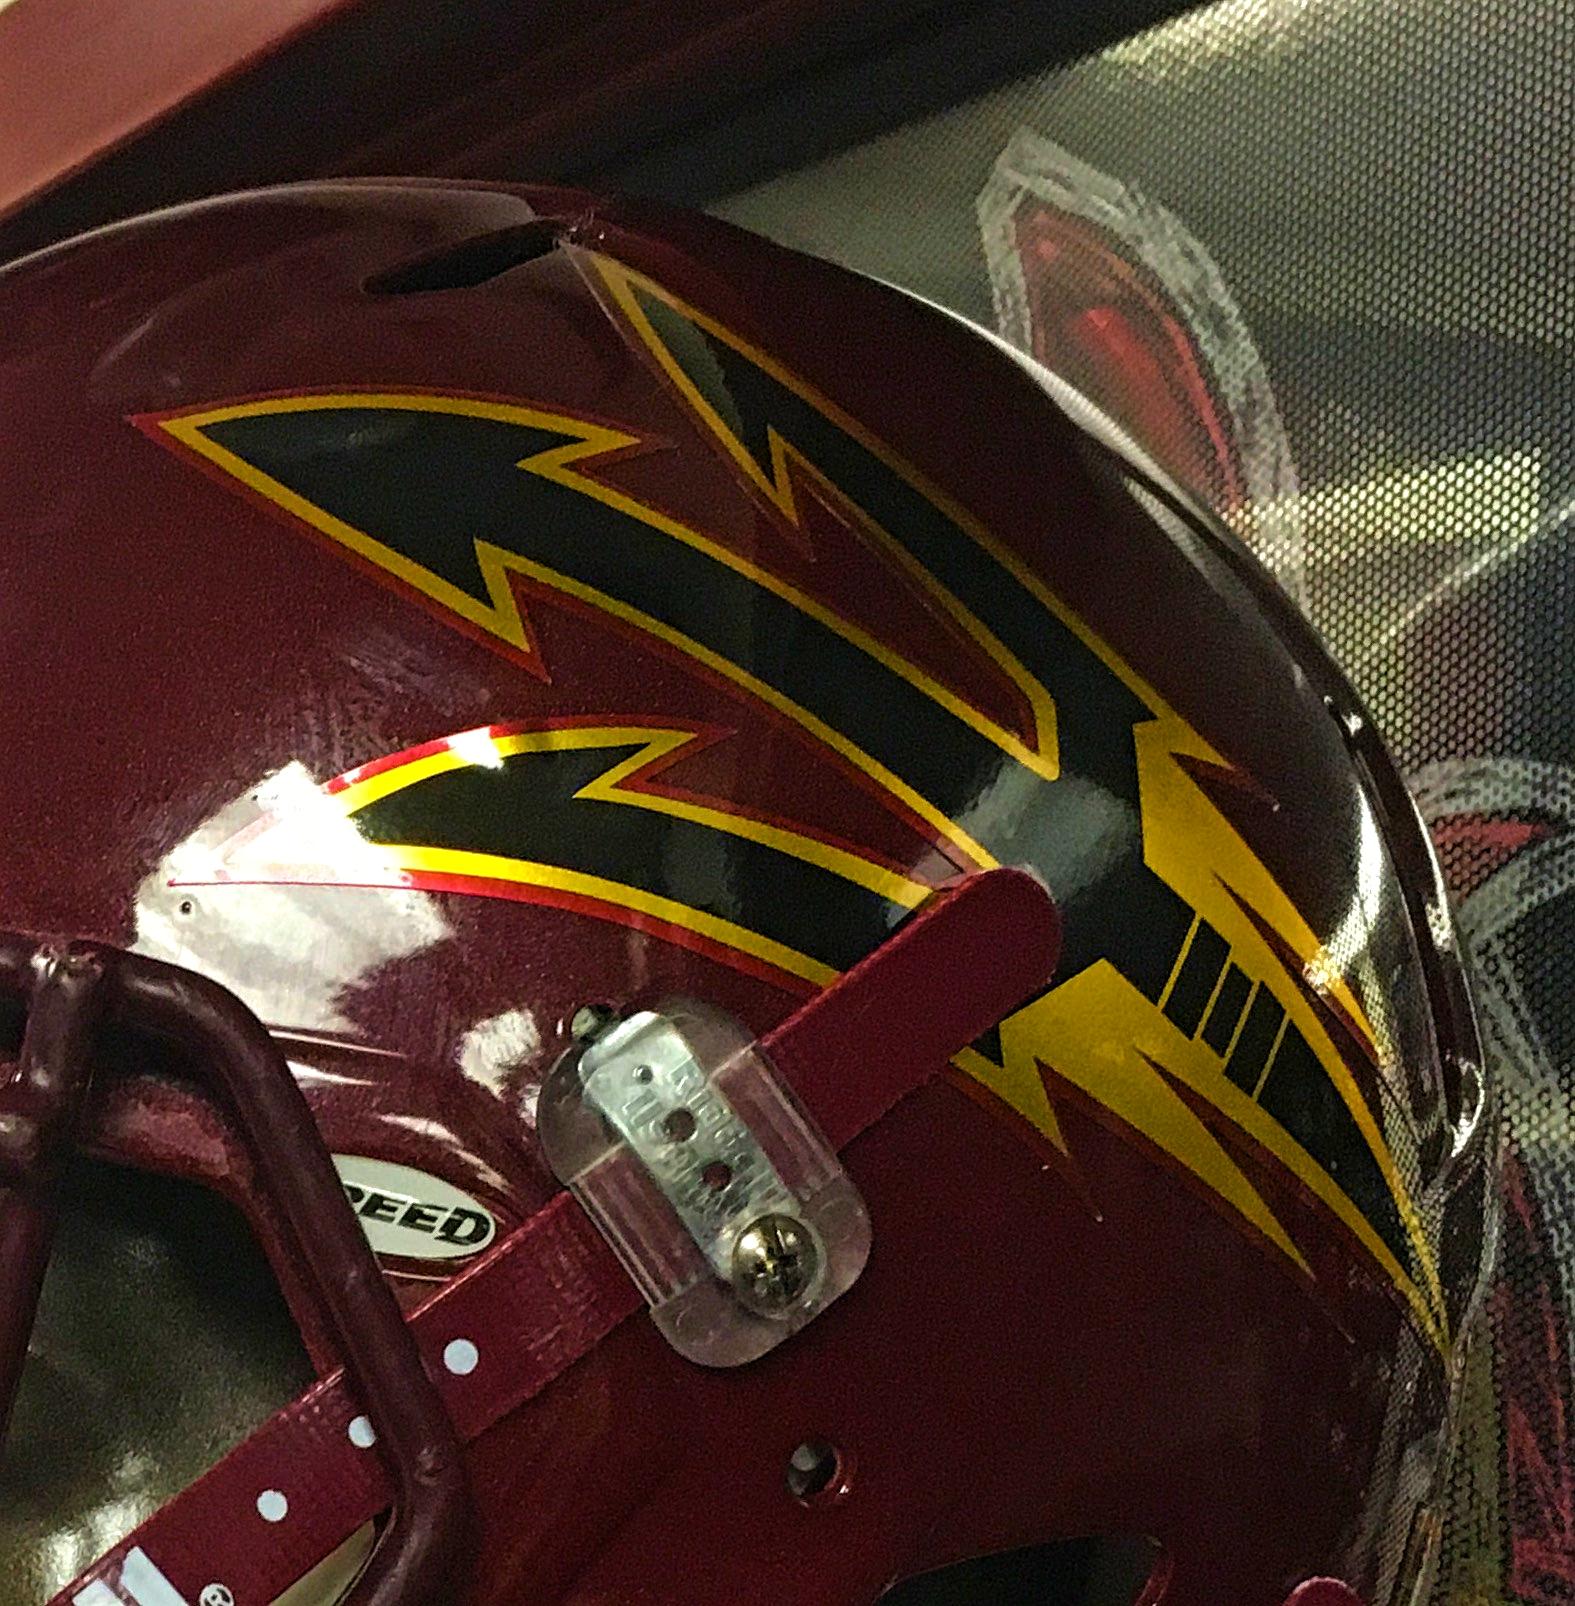 Close-up of this year's Maroon Monsoon helmet